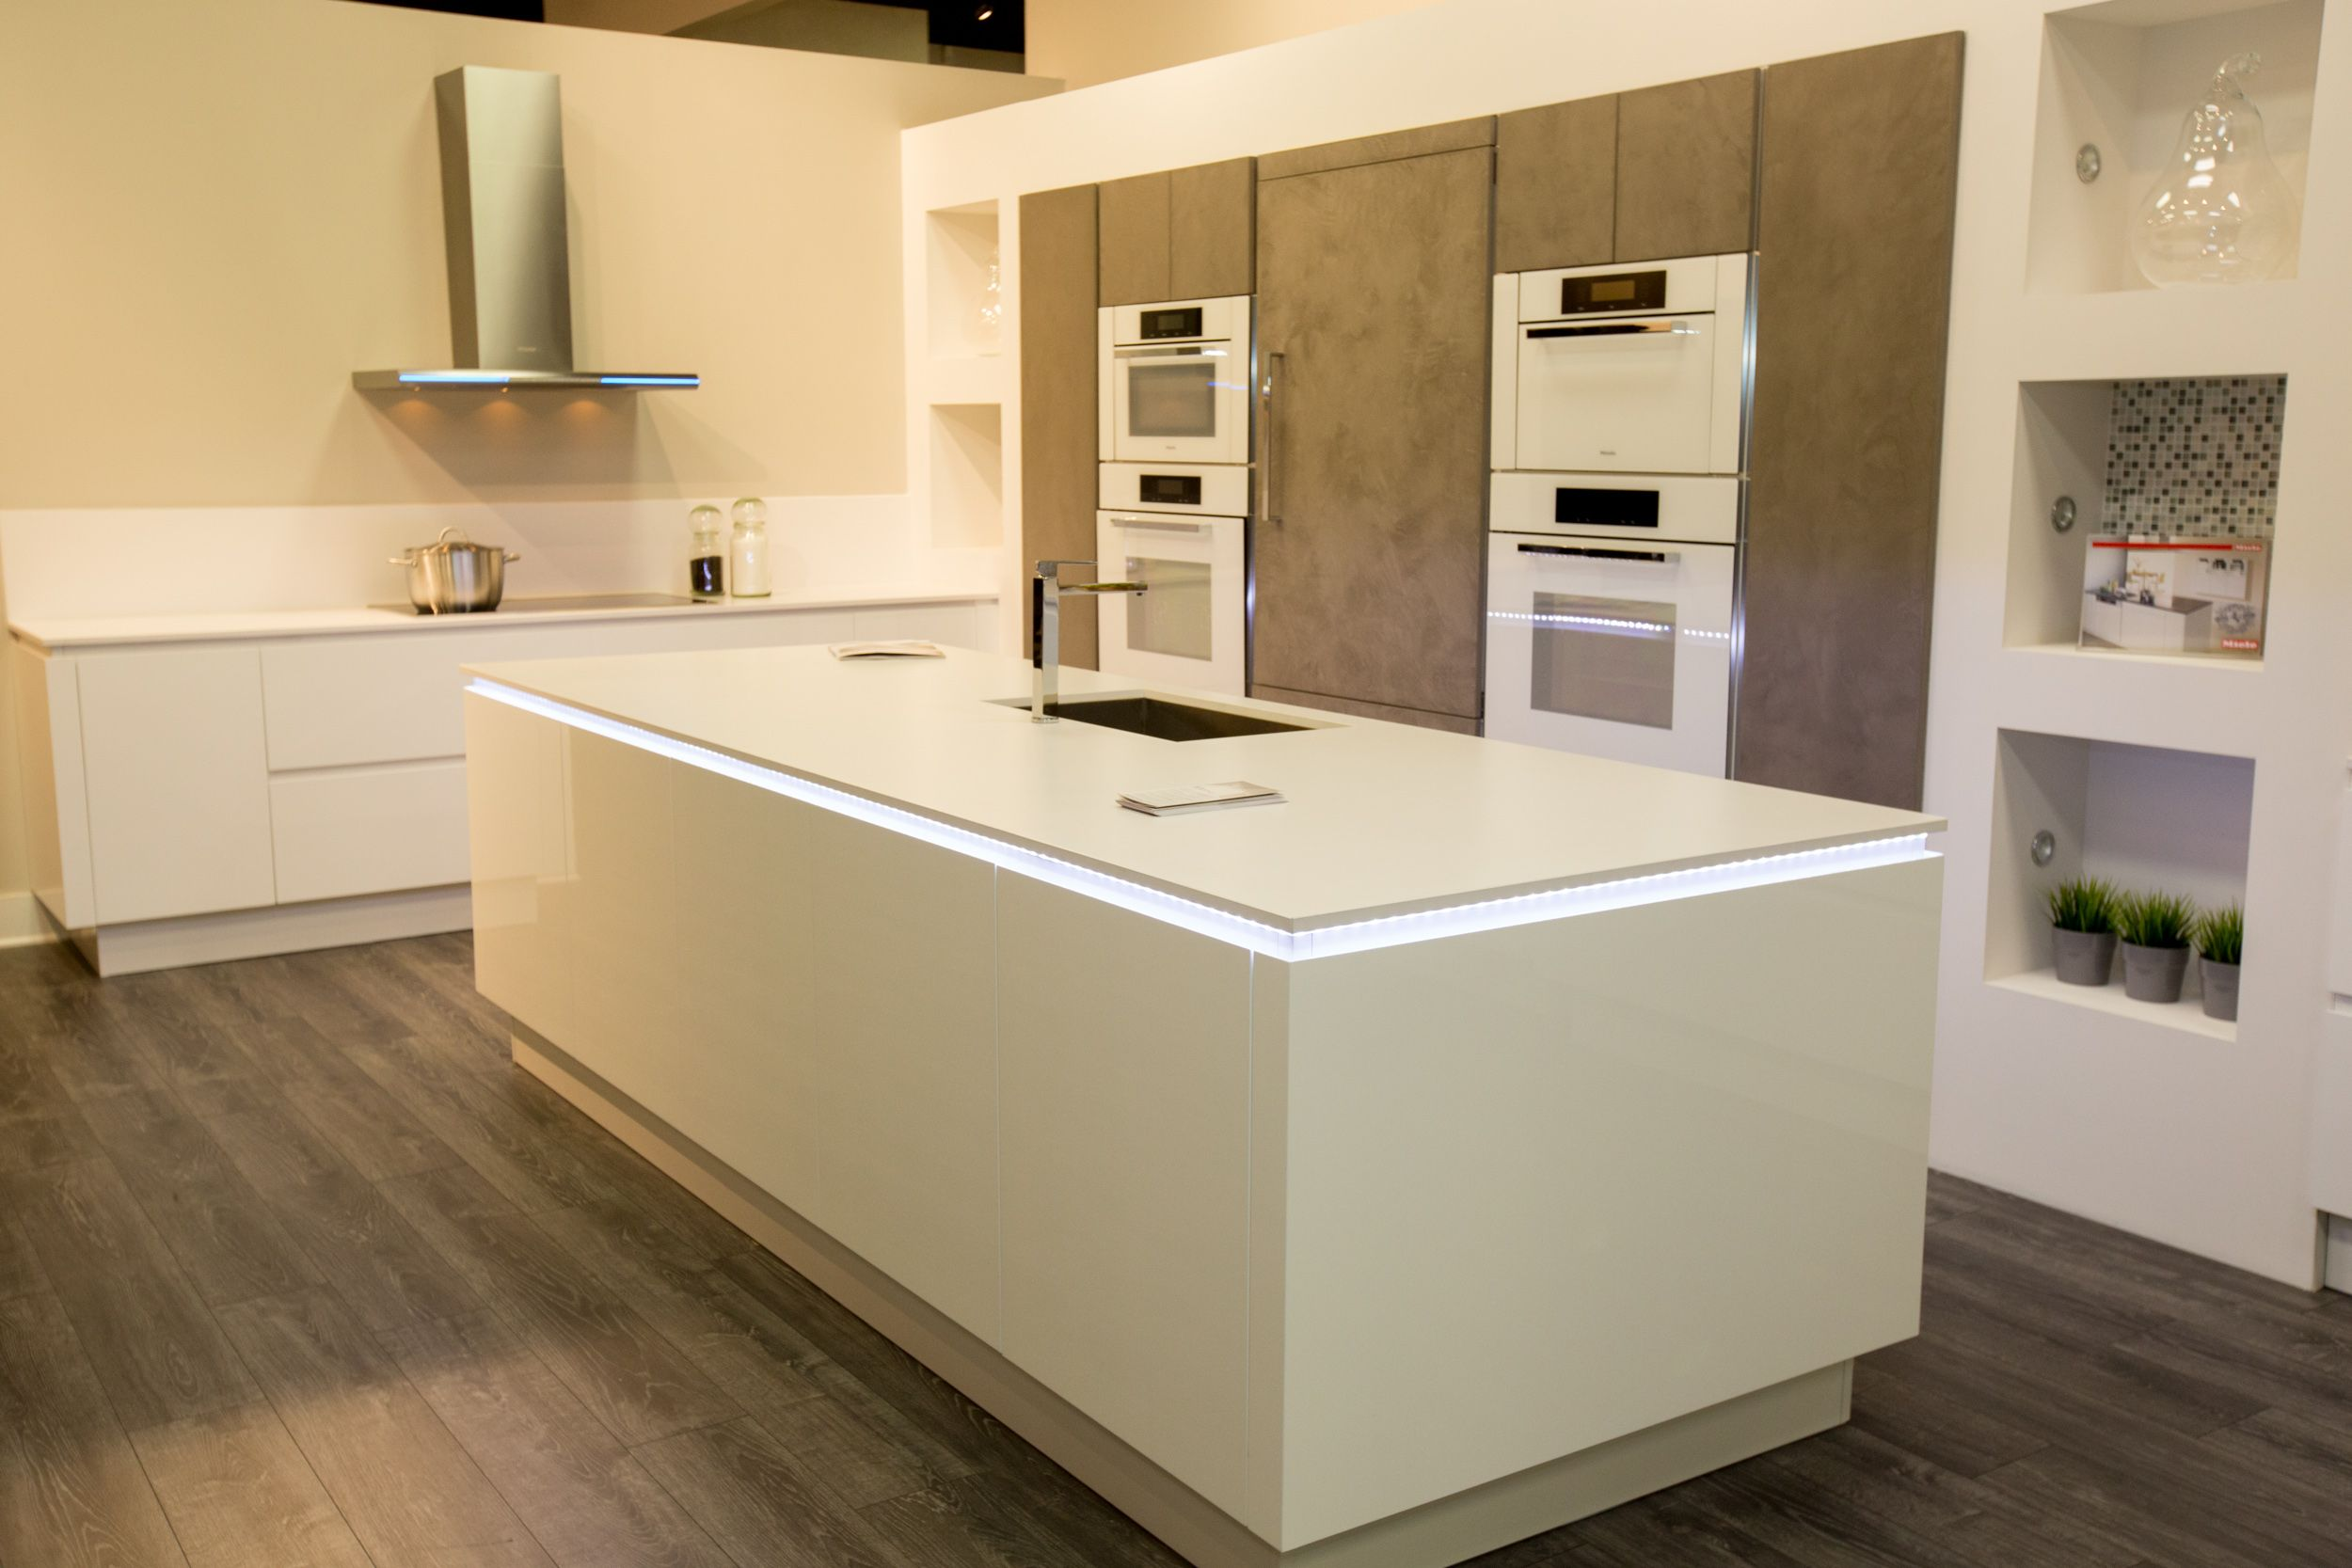 Miele kitchen dream kitchen pinterest for Miele küchen